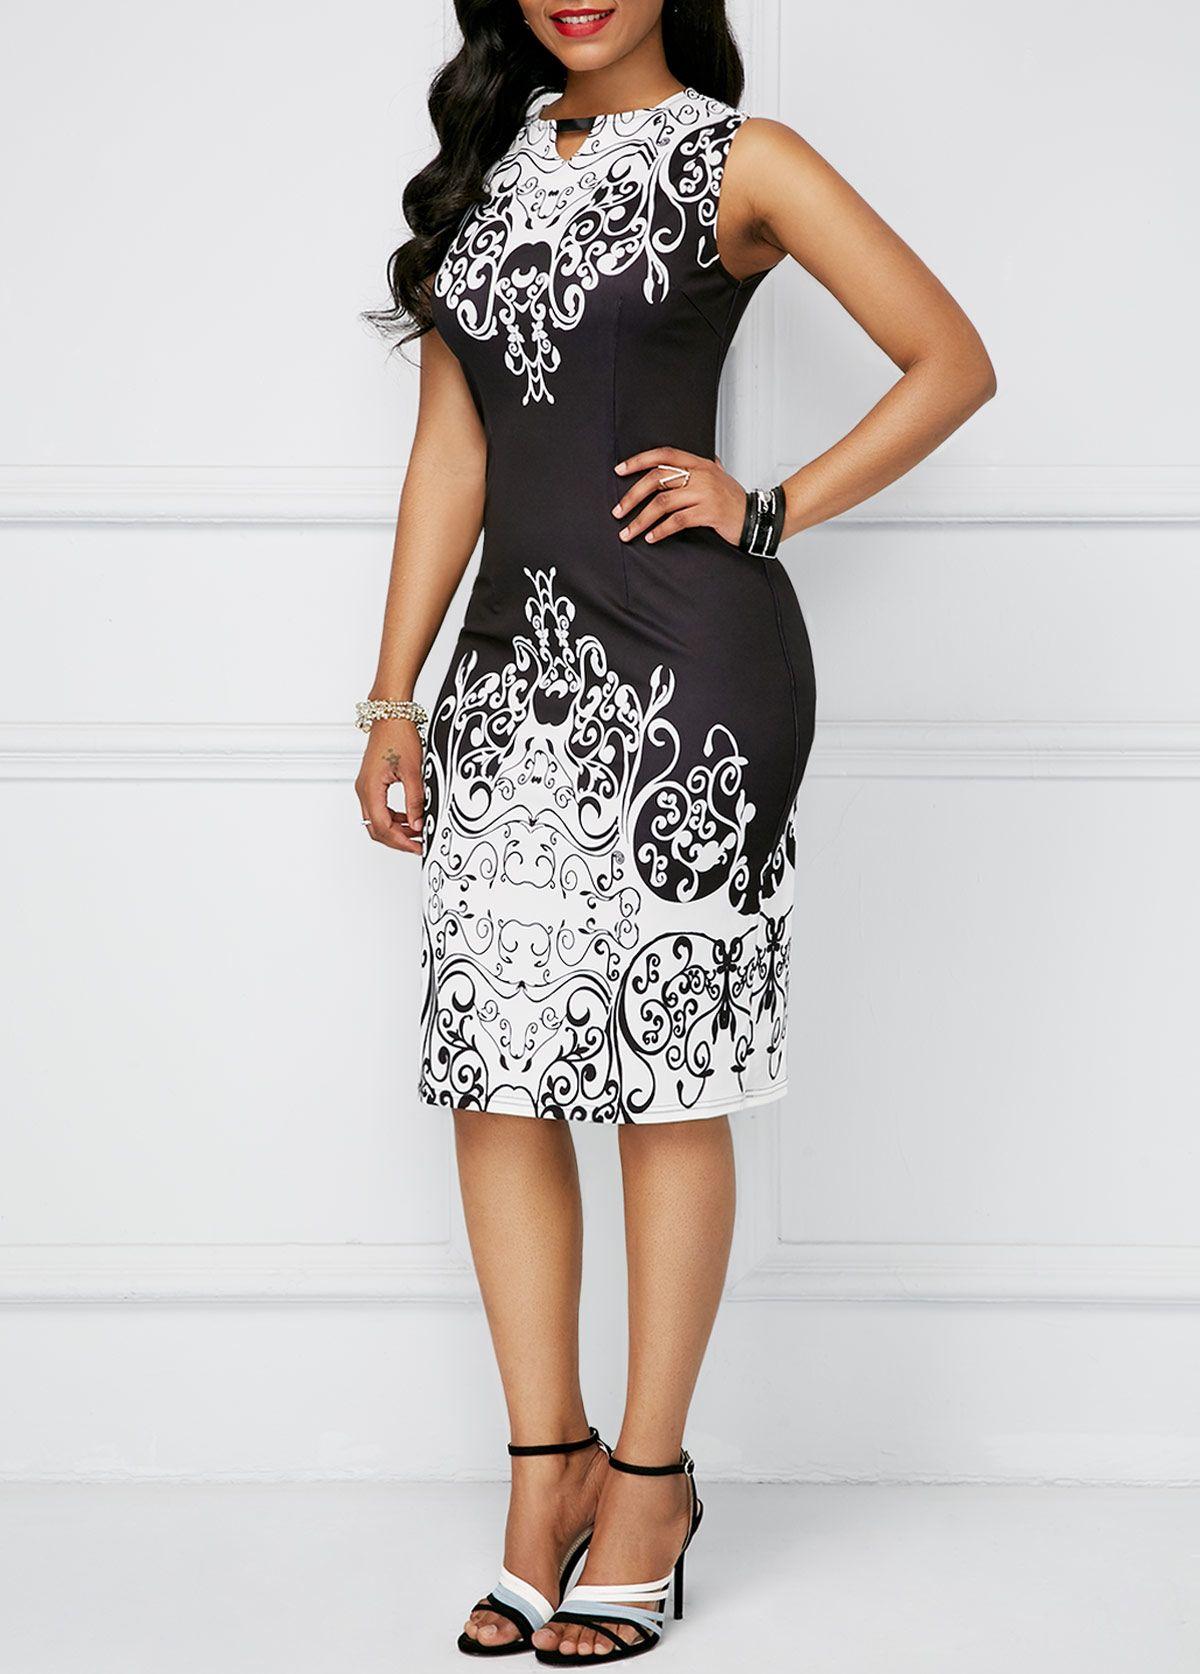 fde67ed4834 Sleeveless High Waist Black Printed Dress